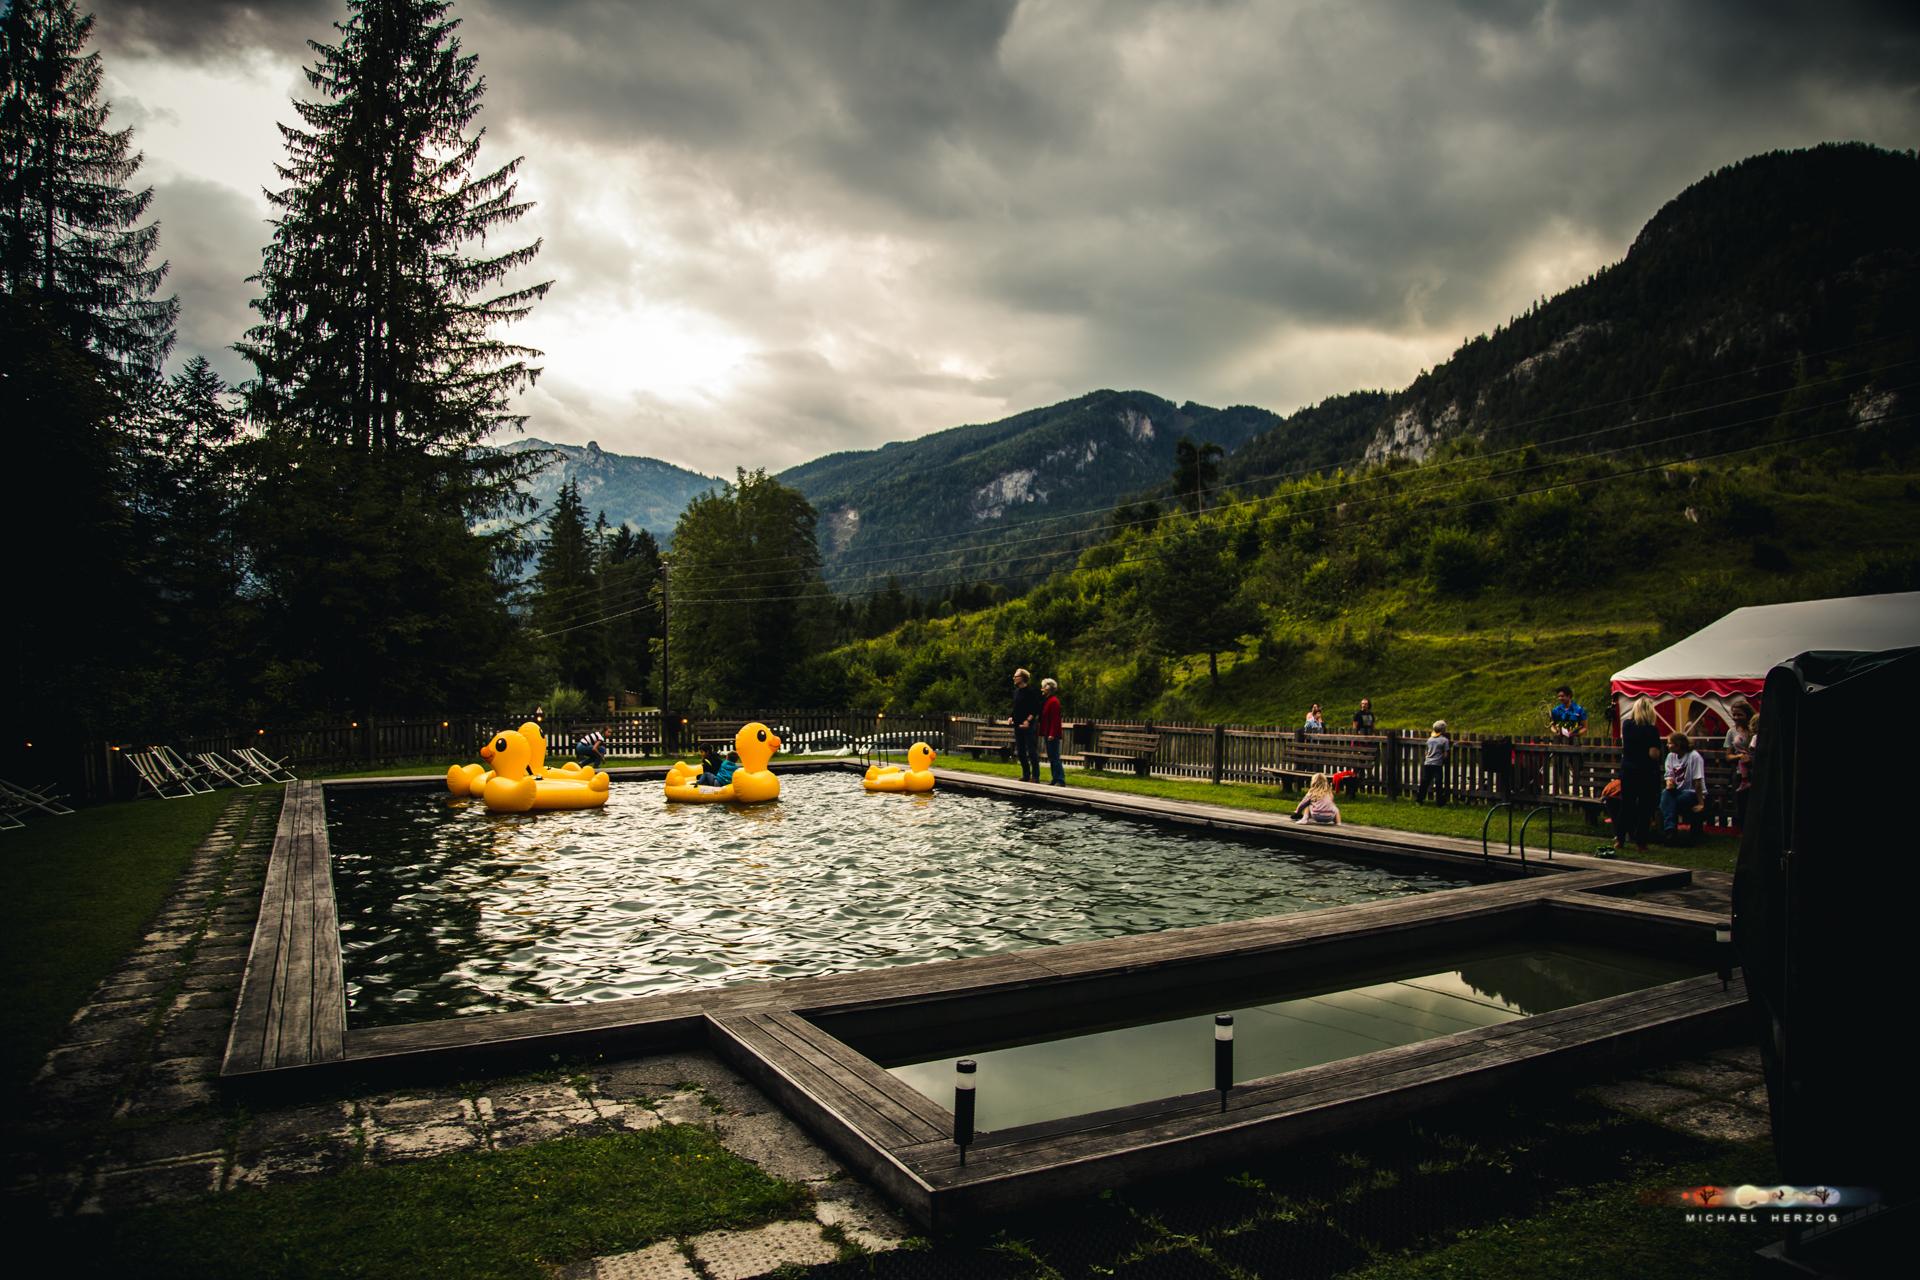 SchwimmbadFest_Sommer2018_MichaelHerzog-8693.jpg